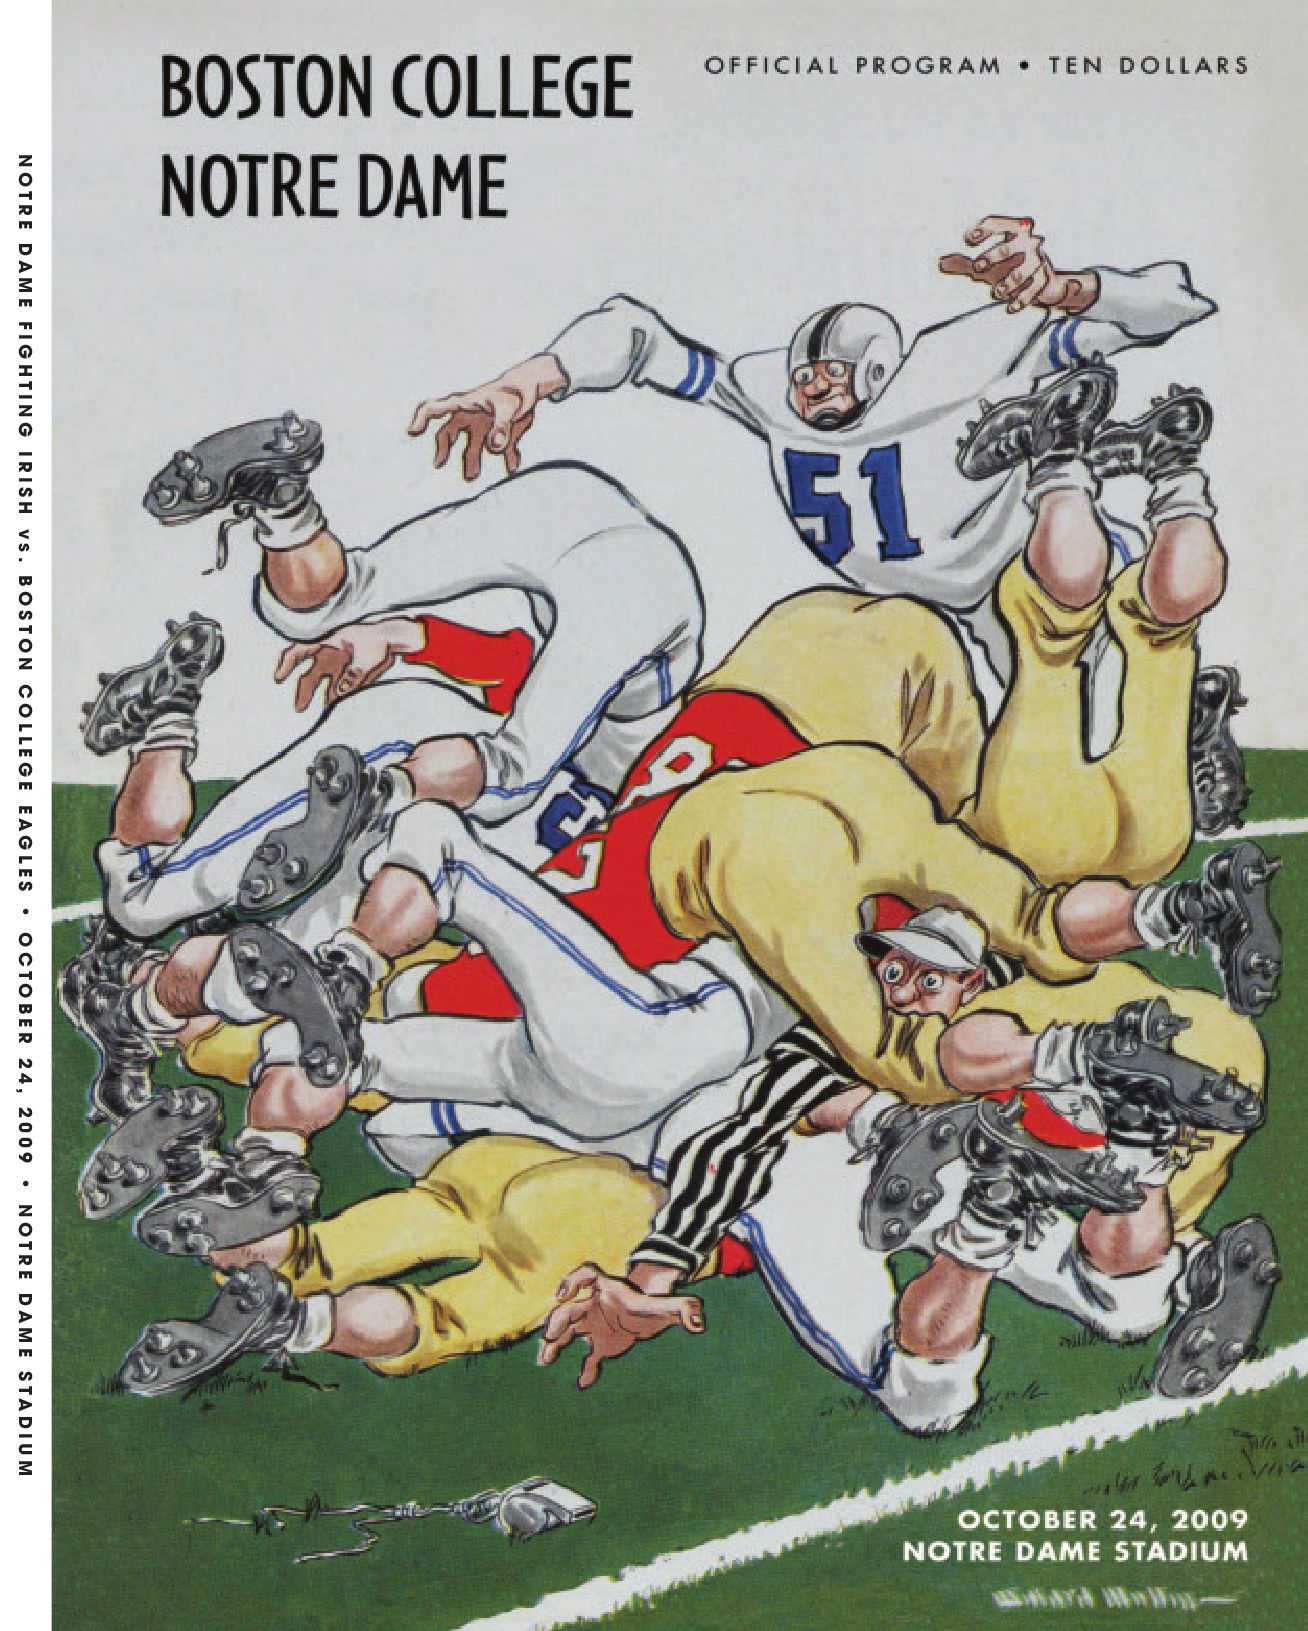 Cheap NFL Jerseys NFL - 2009 Notre Dame Football Game Program - Boston College by Chris ...